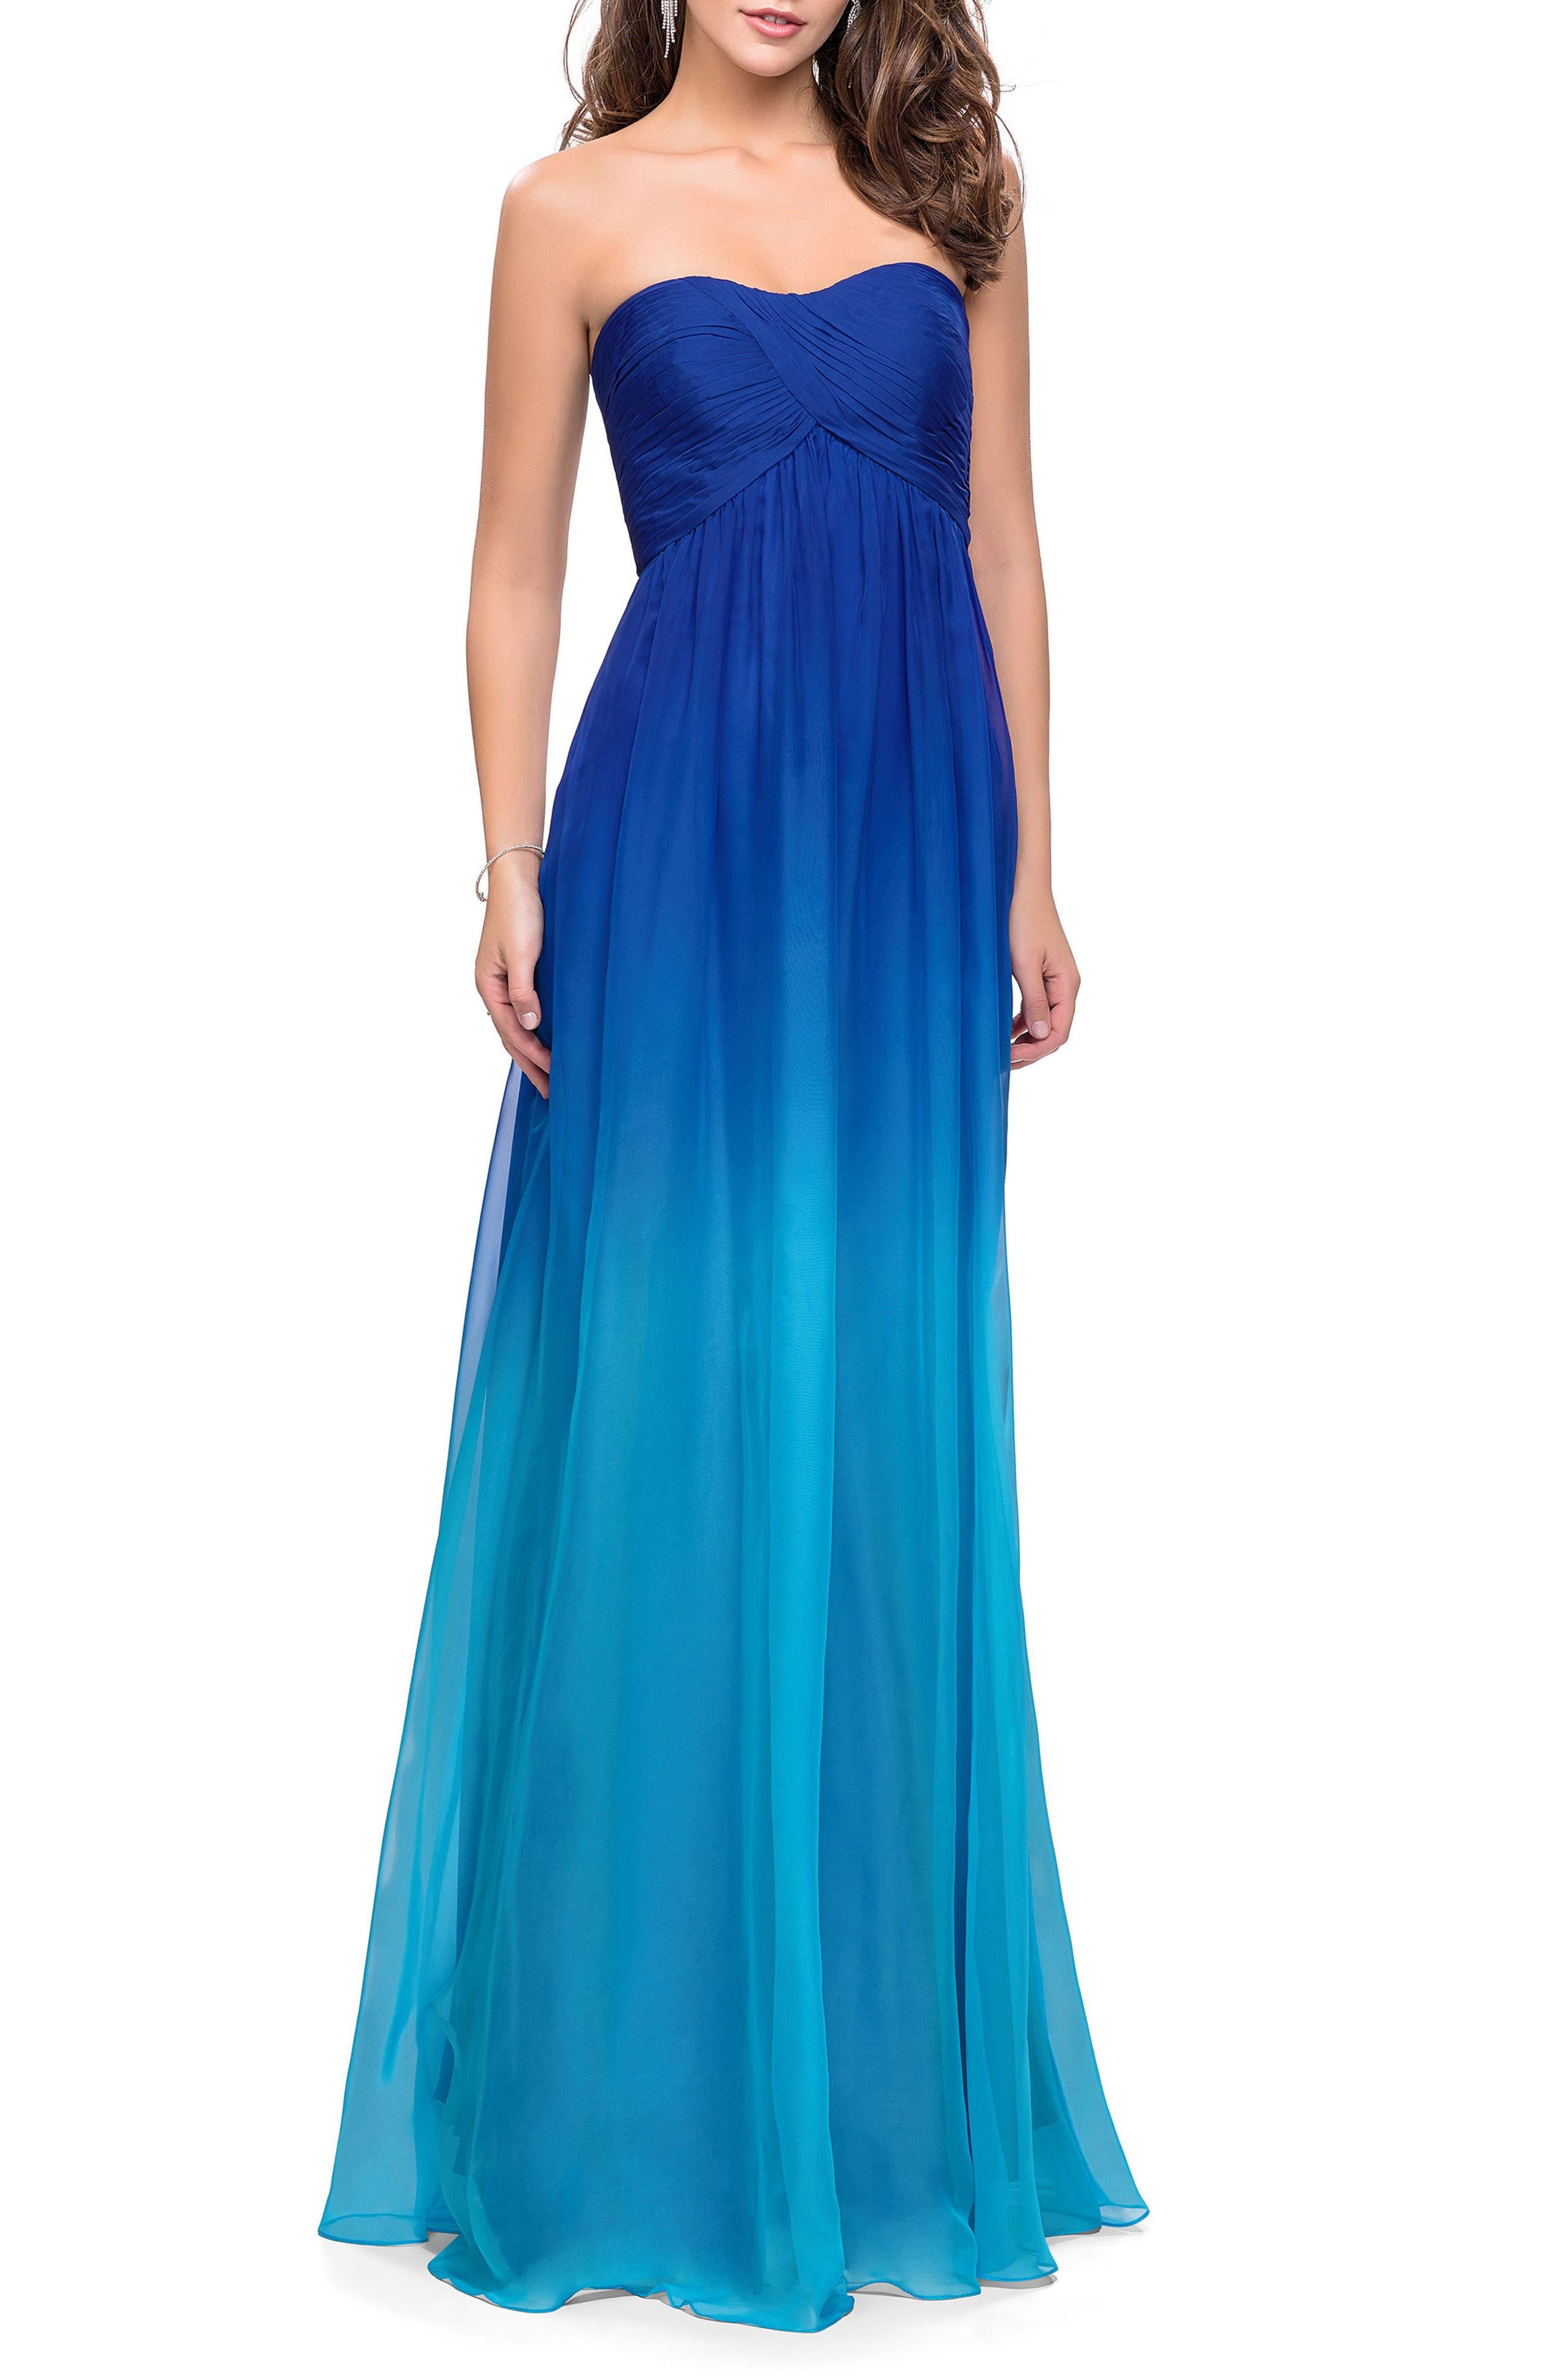 Ruched Ombré Chiffon Strapless Gown,                             Main thumbnail 1, color,                             Royal Aqua